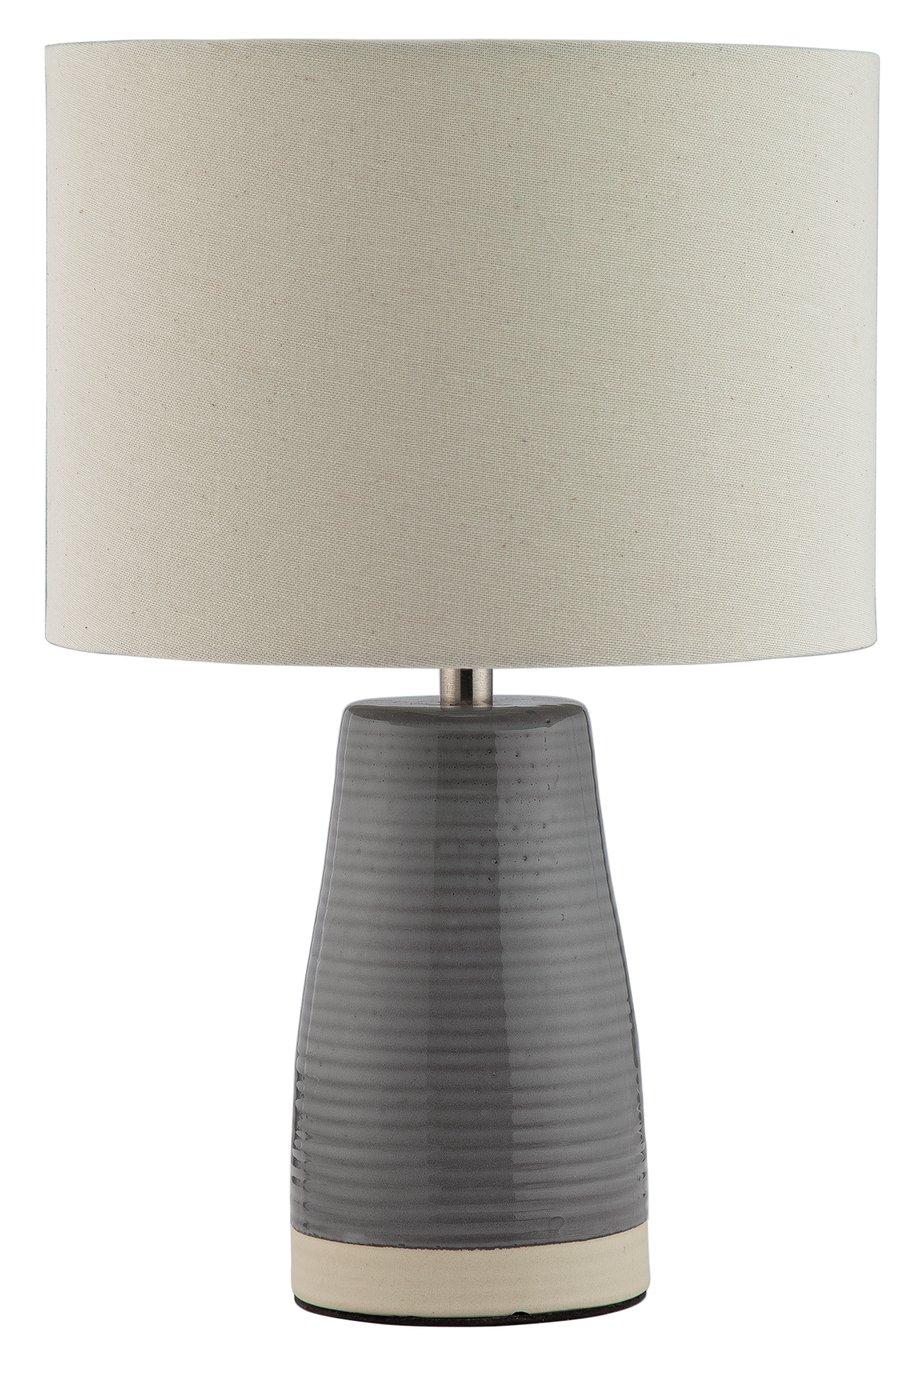 Argos Home Coastal Grey Ceramic Table Lamp